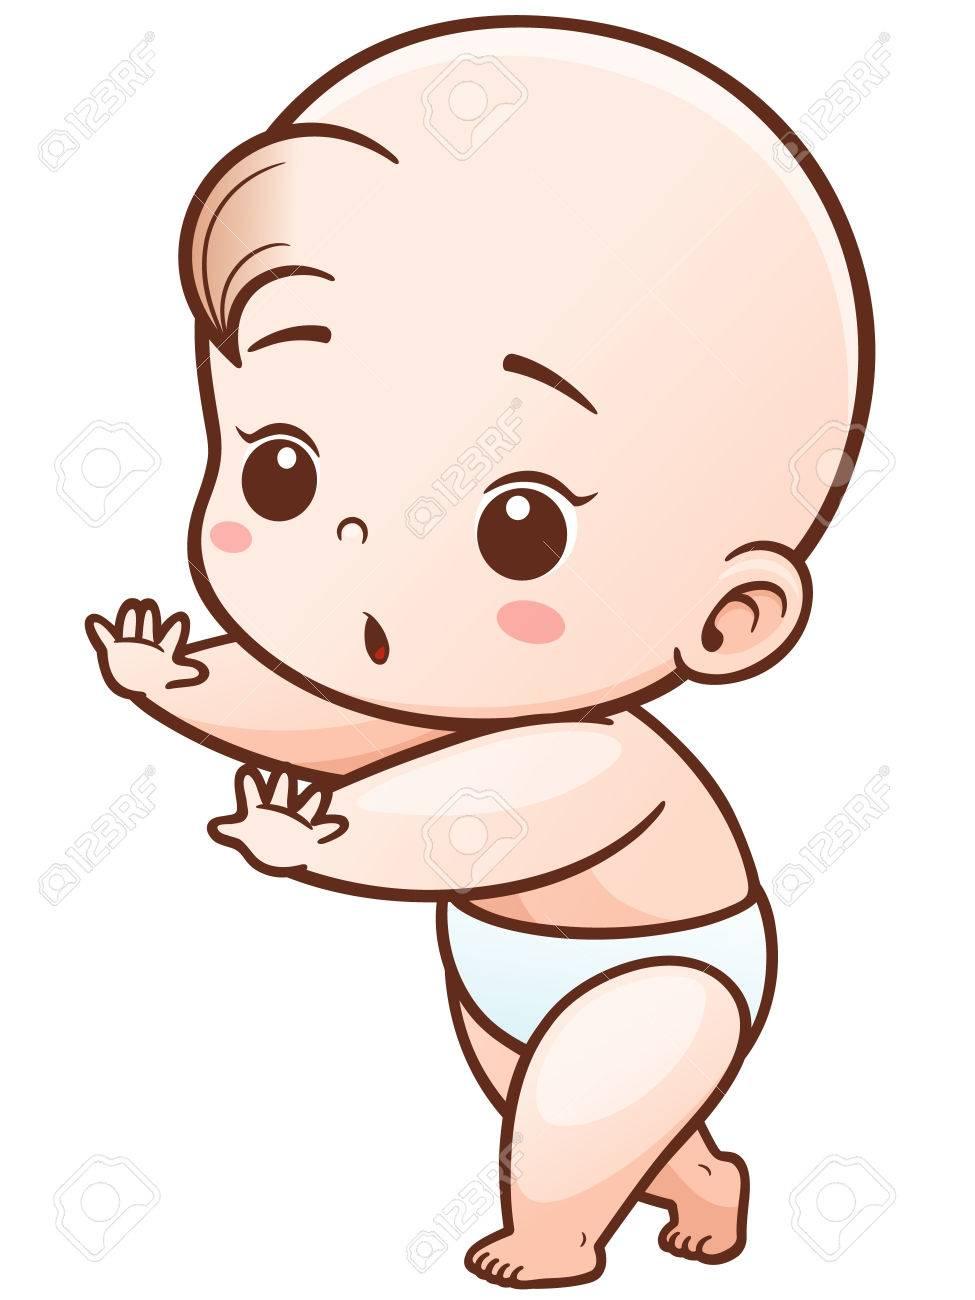 vector illustration of cartoon cute baby learn to walk royalty free rh 123rf com baby vector art free baby vector art